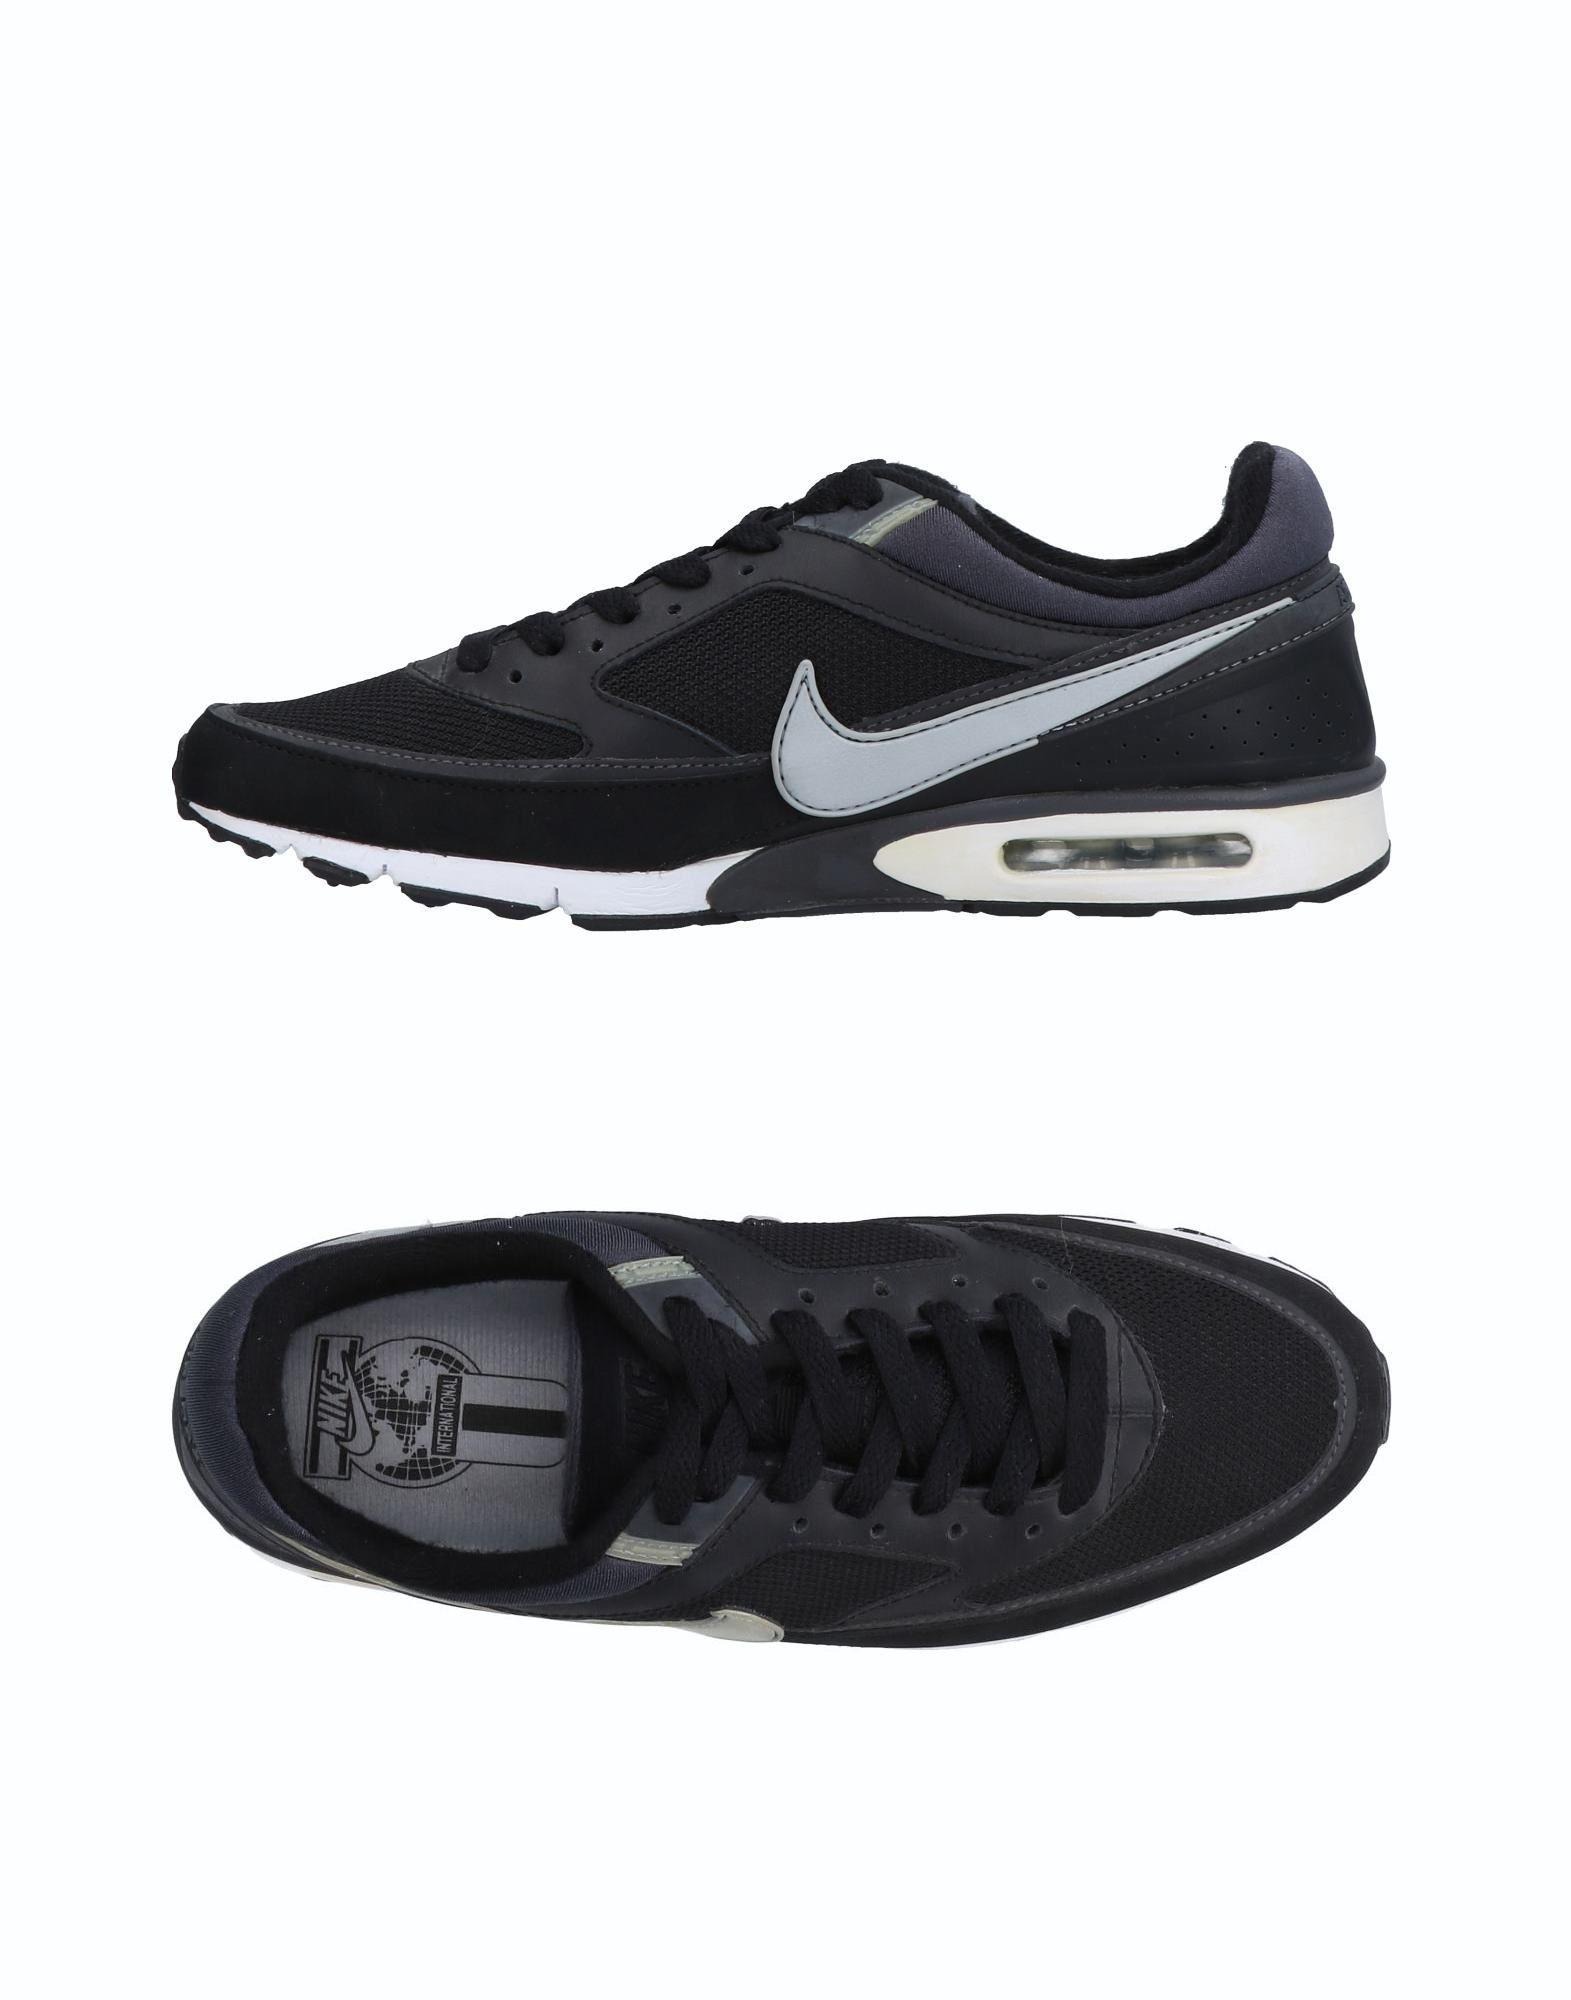 Moda Sneakers Sneakers Moda Nike Donna - 11506281GI 8e0115